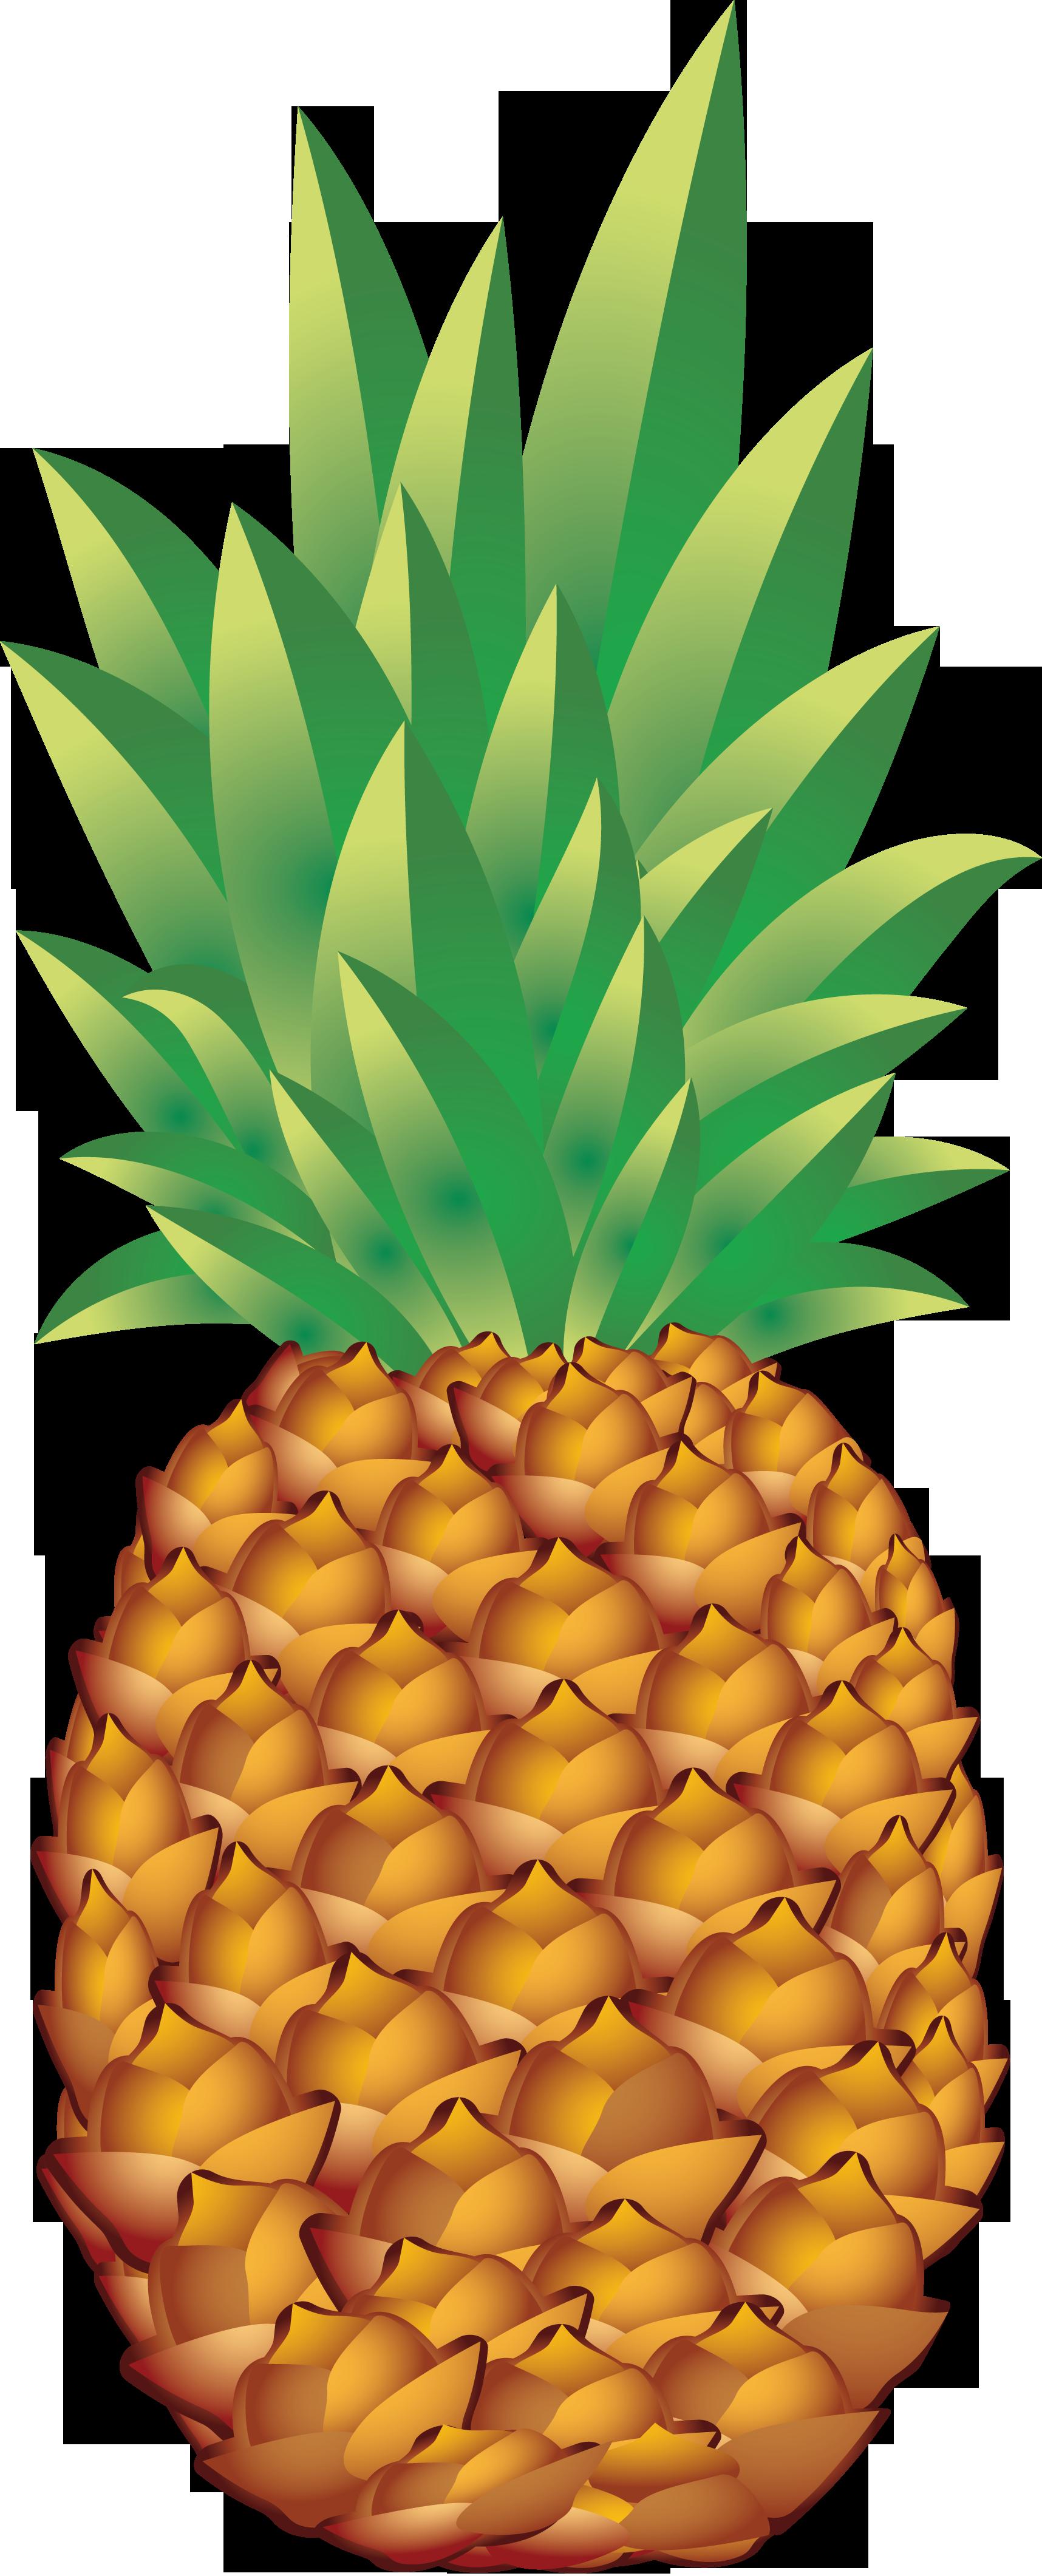 Pineapple clipart pastel. Tumblr google search transparent